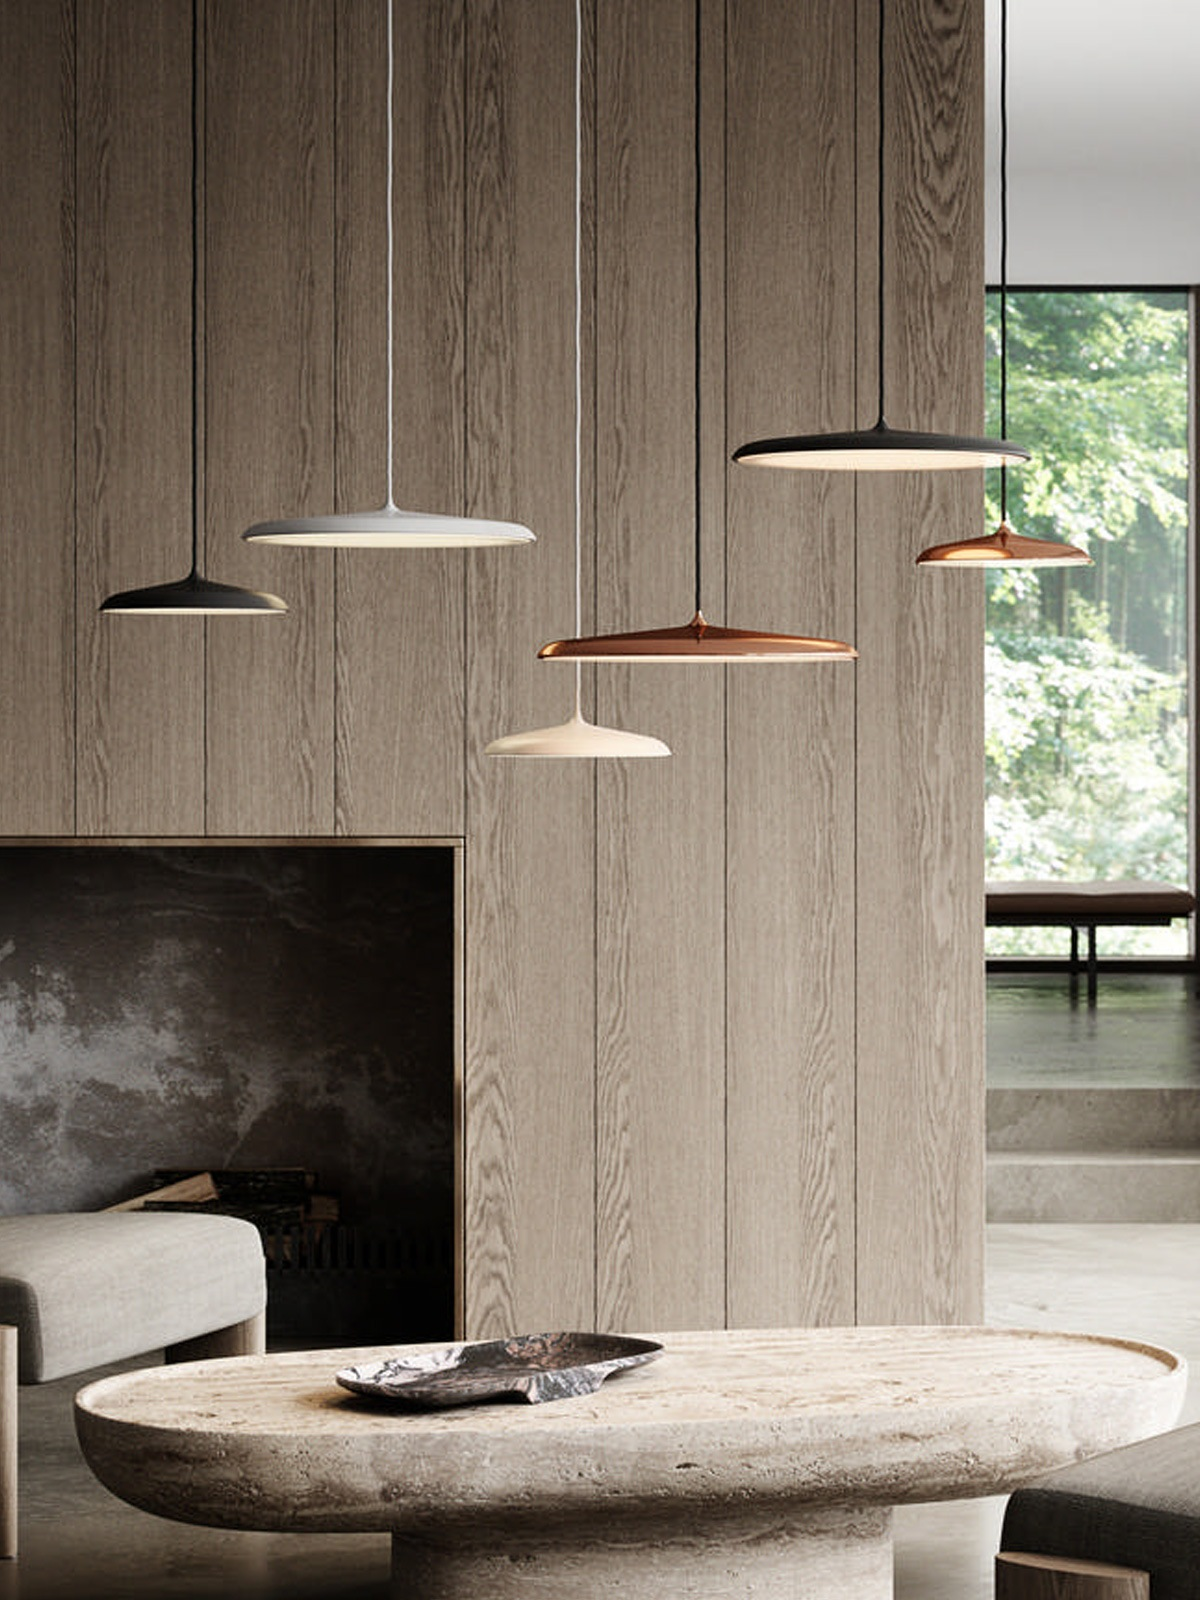 DesignOrt Lampen Blog: Artist Pendelleuchten Design for the People by Nordlux DesignOrt Onlineshop Lampen